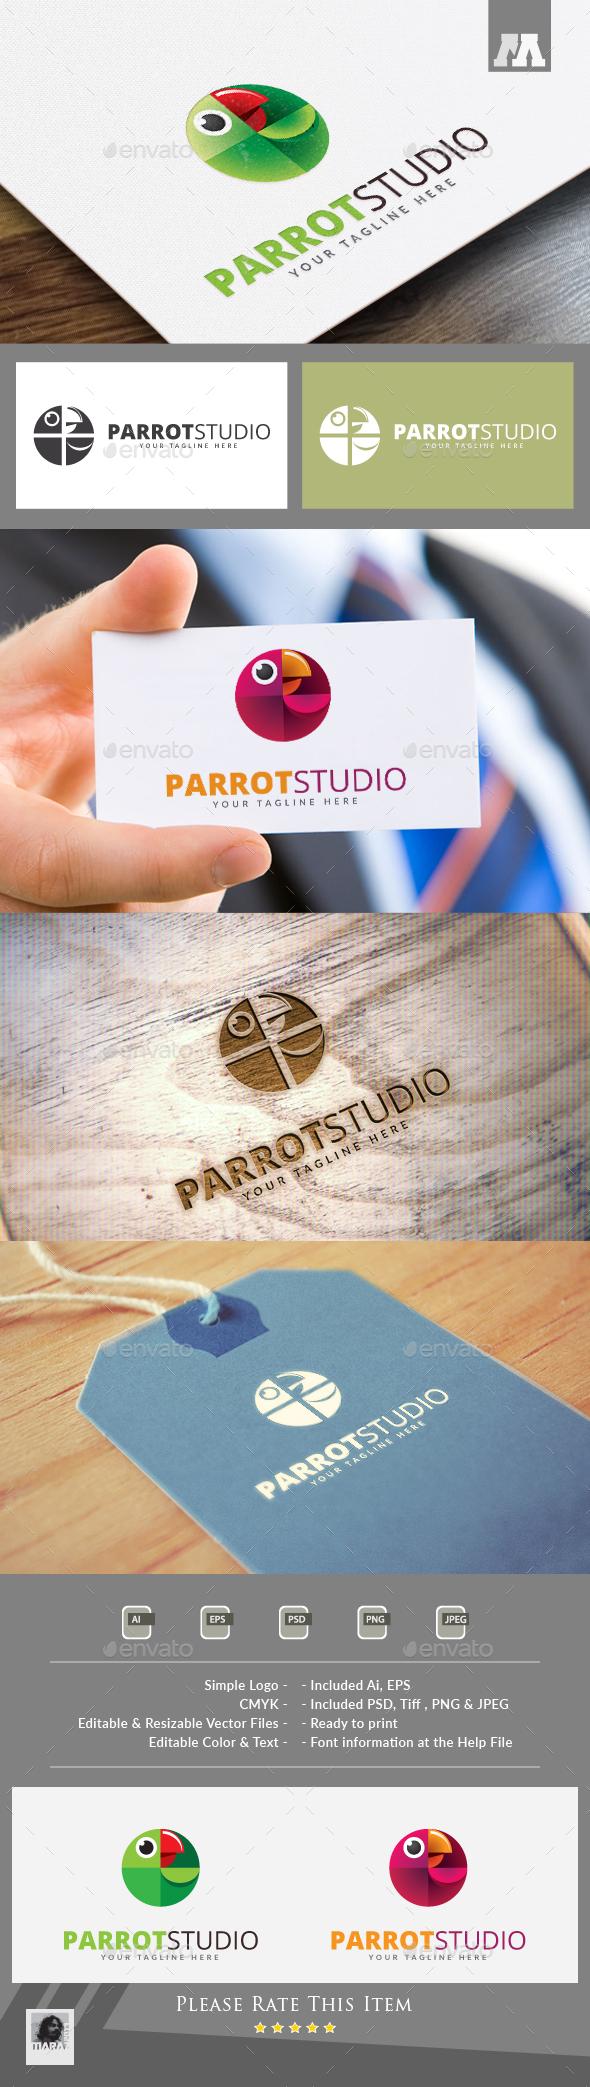 Parrot Studio Logo - Animals Logo Templates